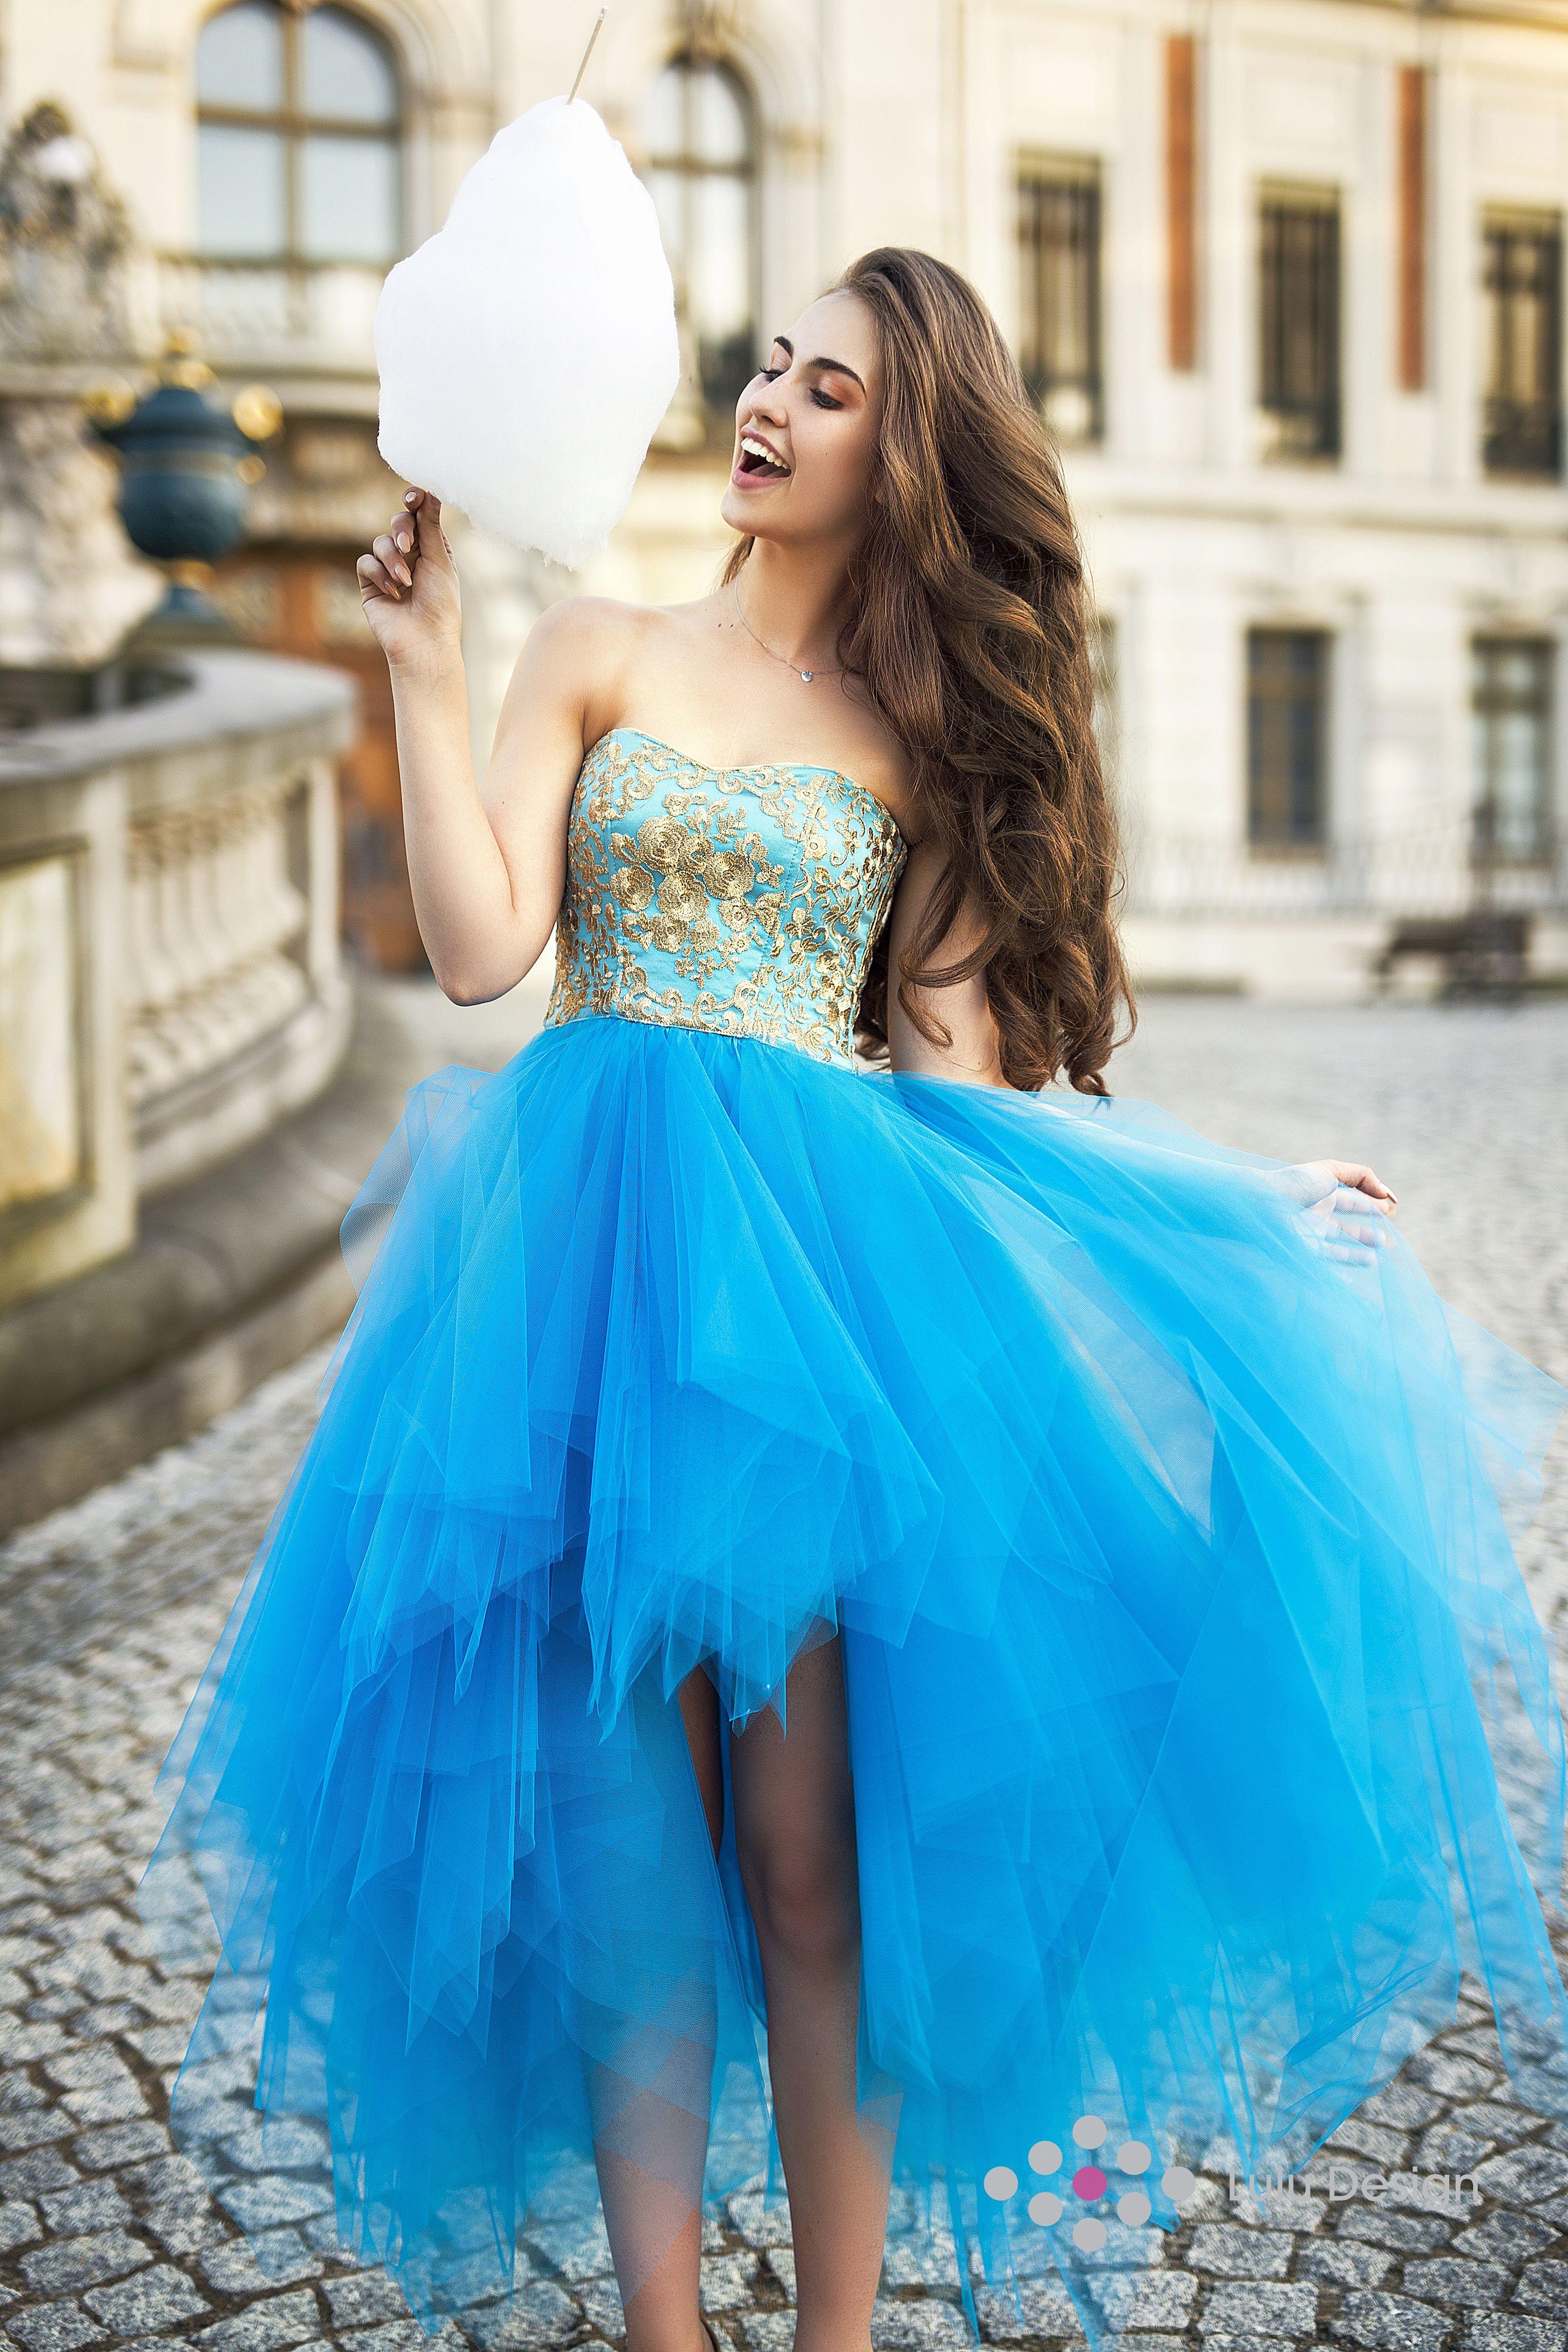 823dfae61c Suknia Montana Lace marki Lulu Design. Mnóstwo tiulu i piękna złota koronka   lt 3